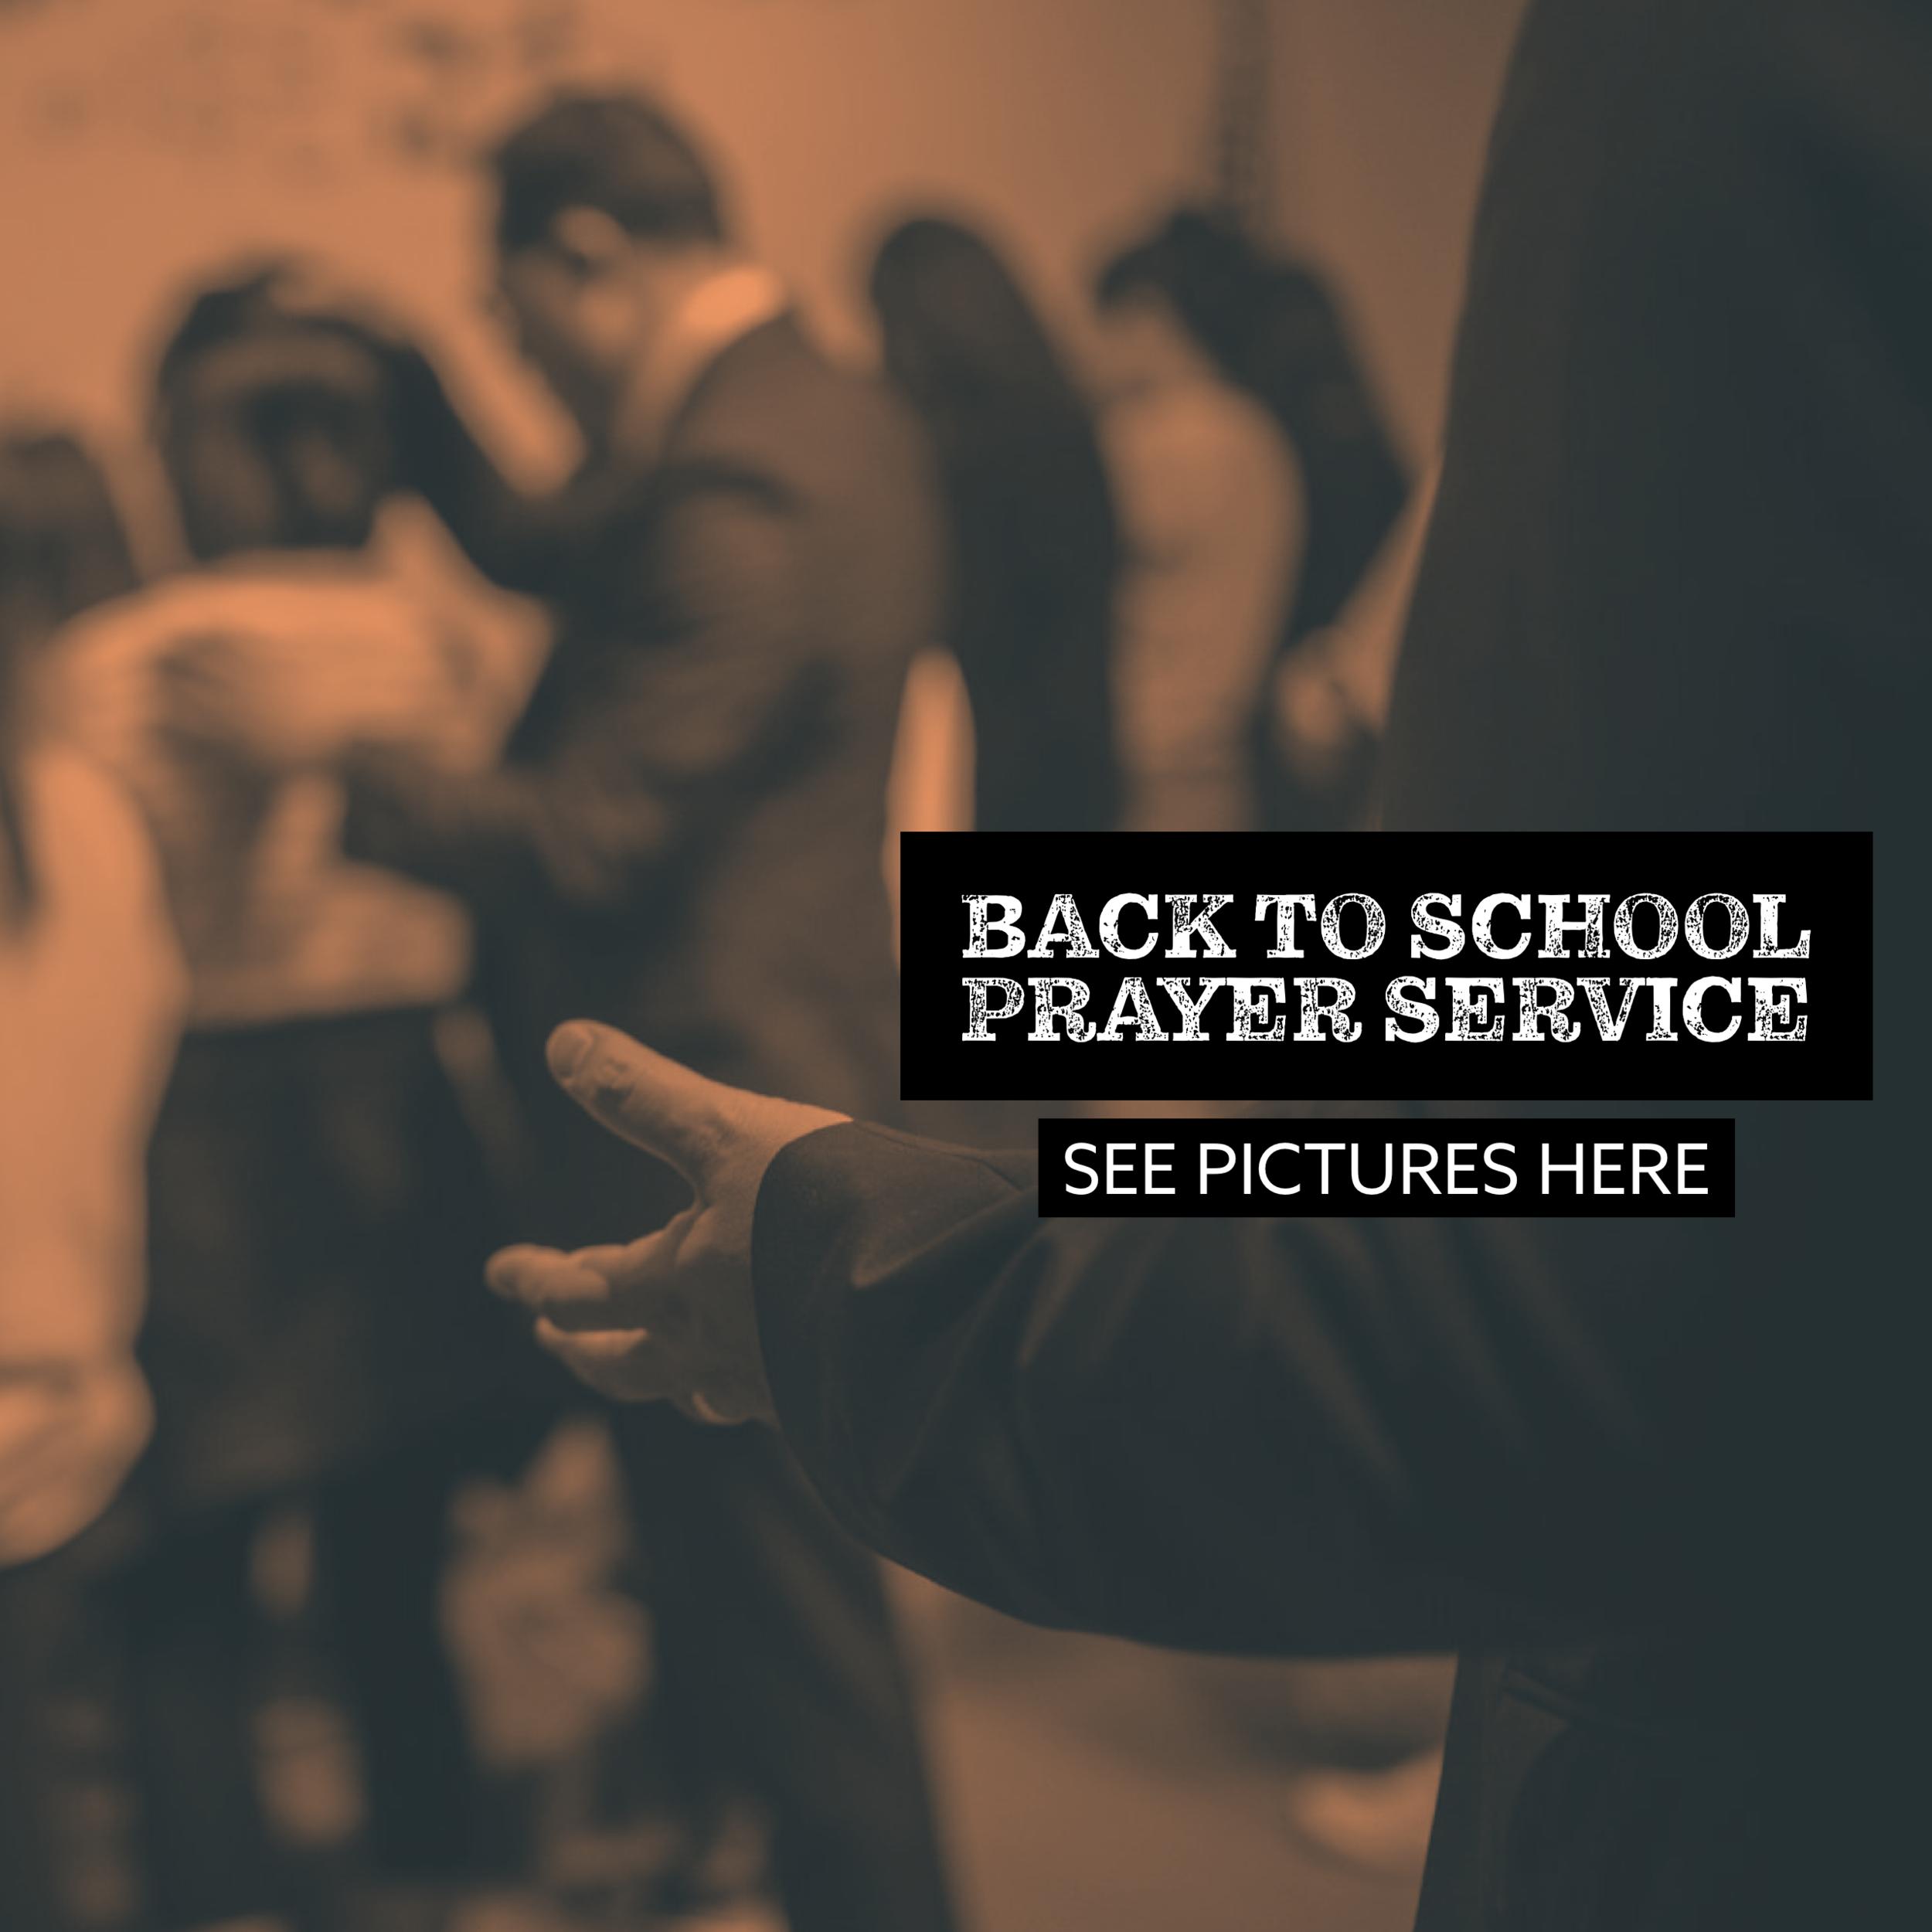 Back to school prayer service.PNG